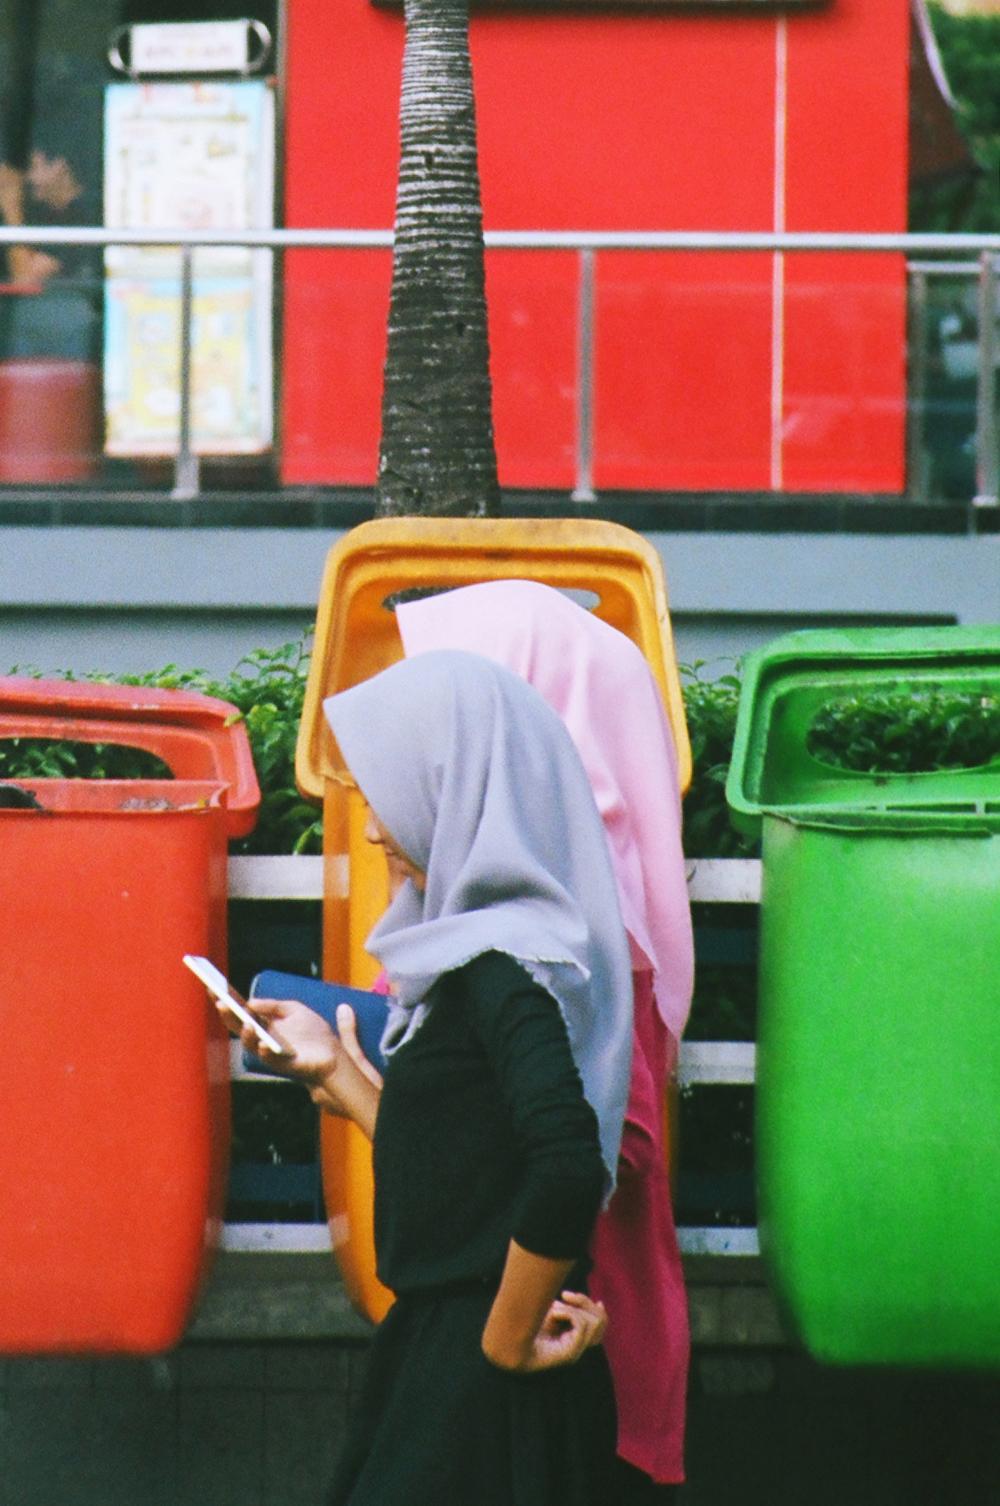 Jakarta-Film-14a-casenruiz.jpg